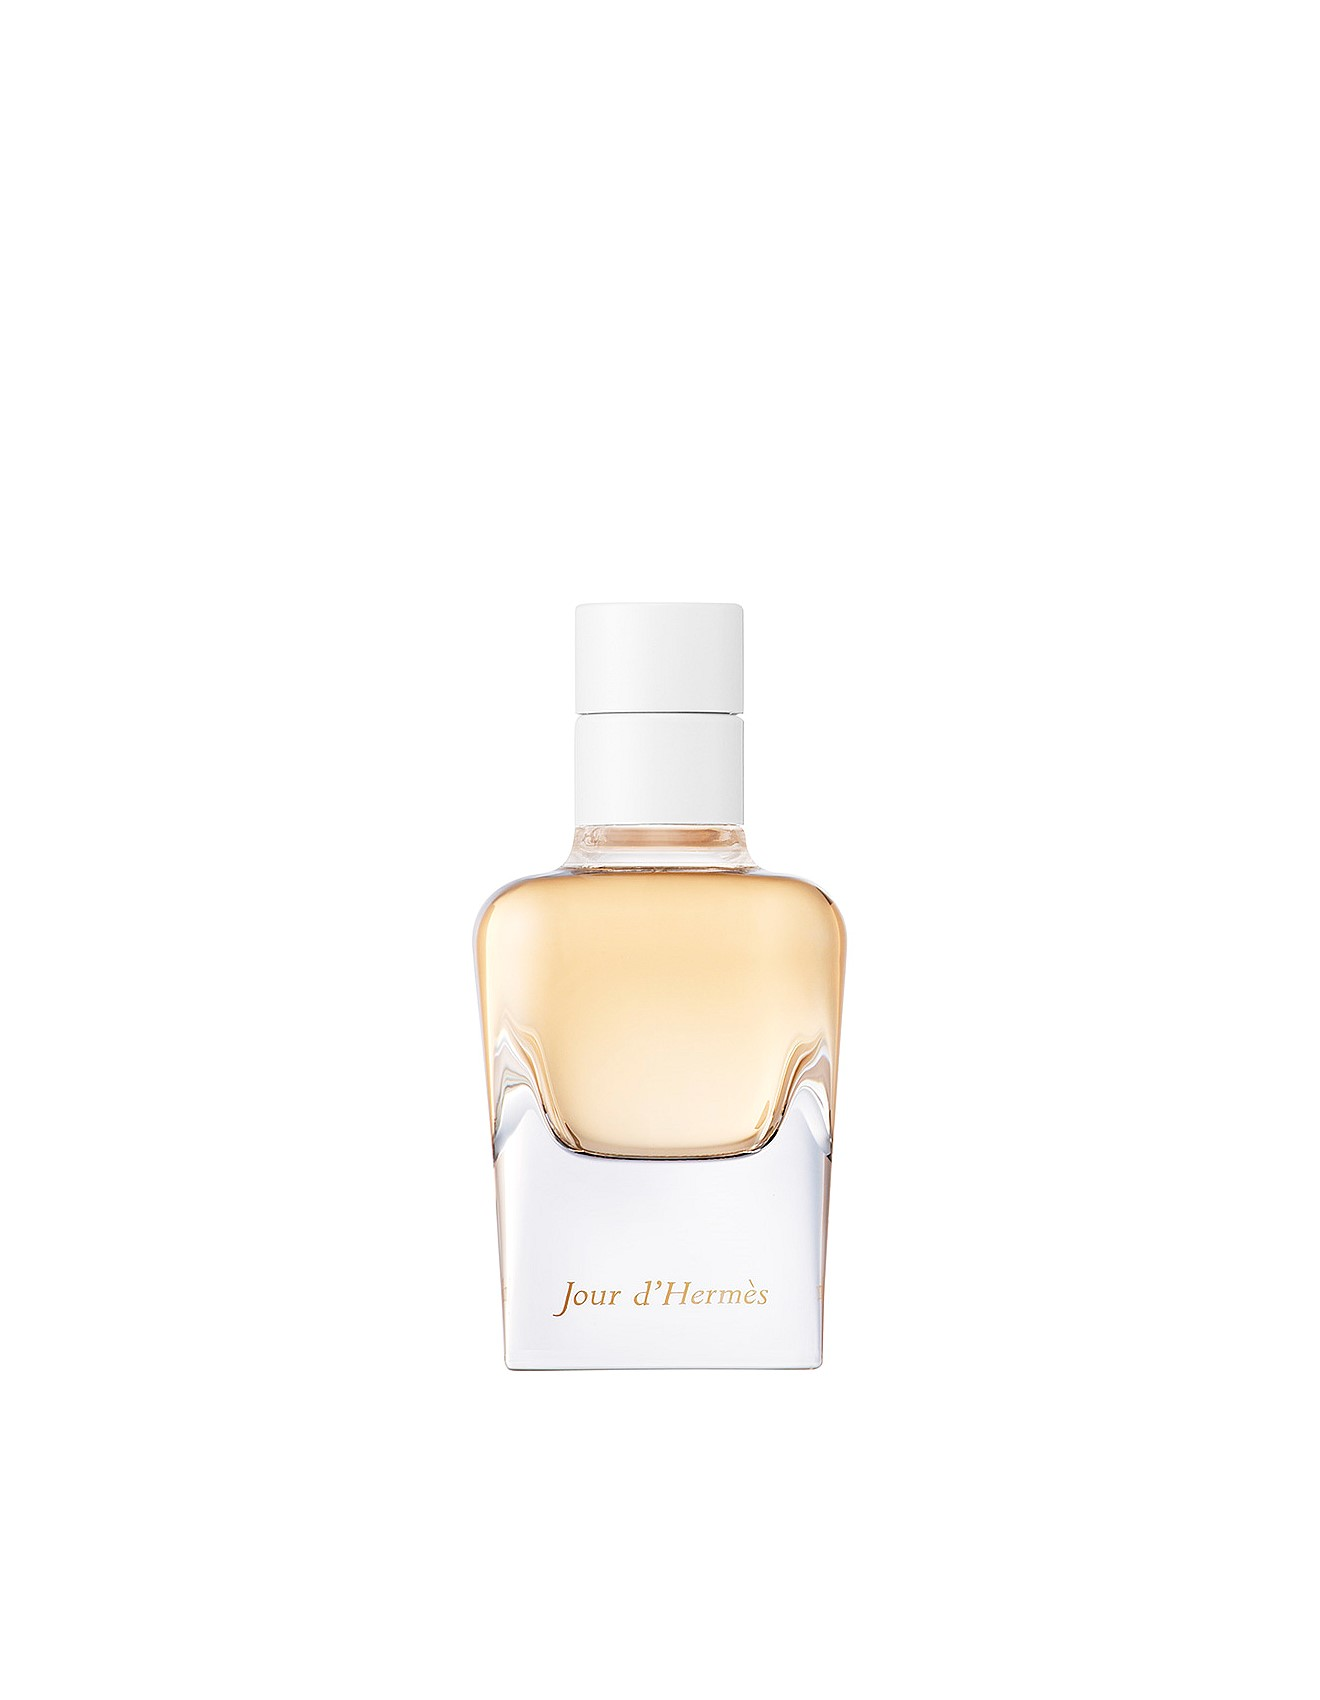 24c90aec7220 Hermès | Buy Hermès Perfume & More Online | David Jones - Jour d ...